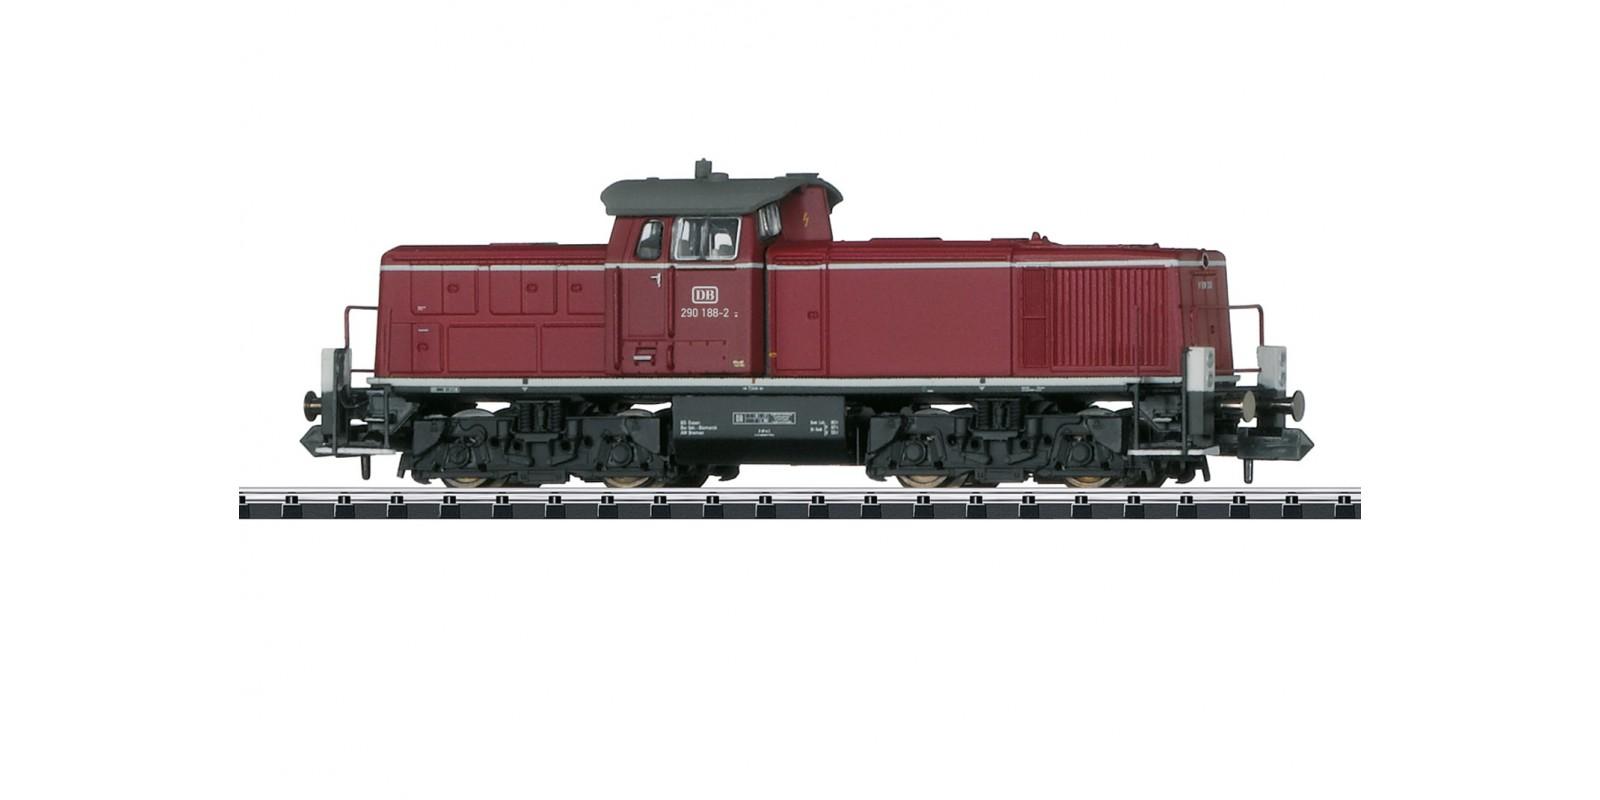 T16297 Class 290 Diesel Locomotive